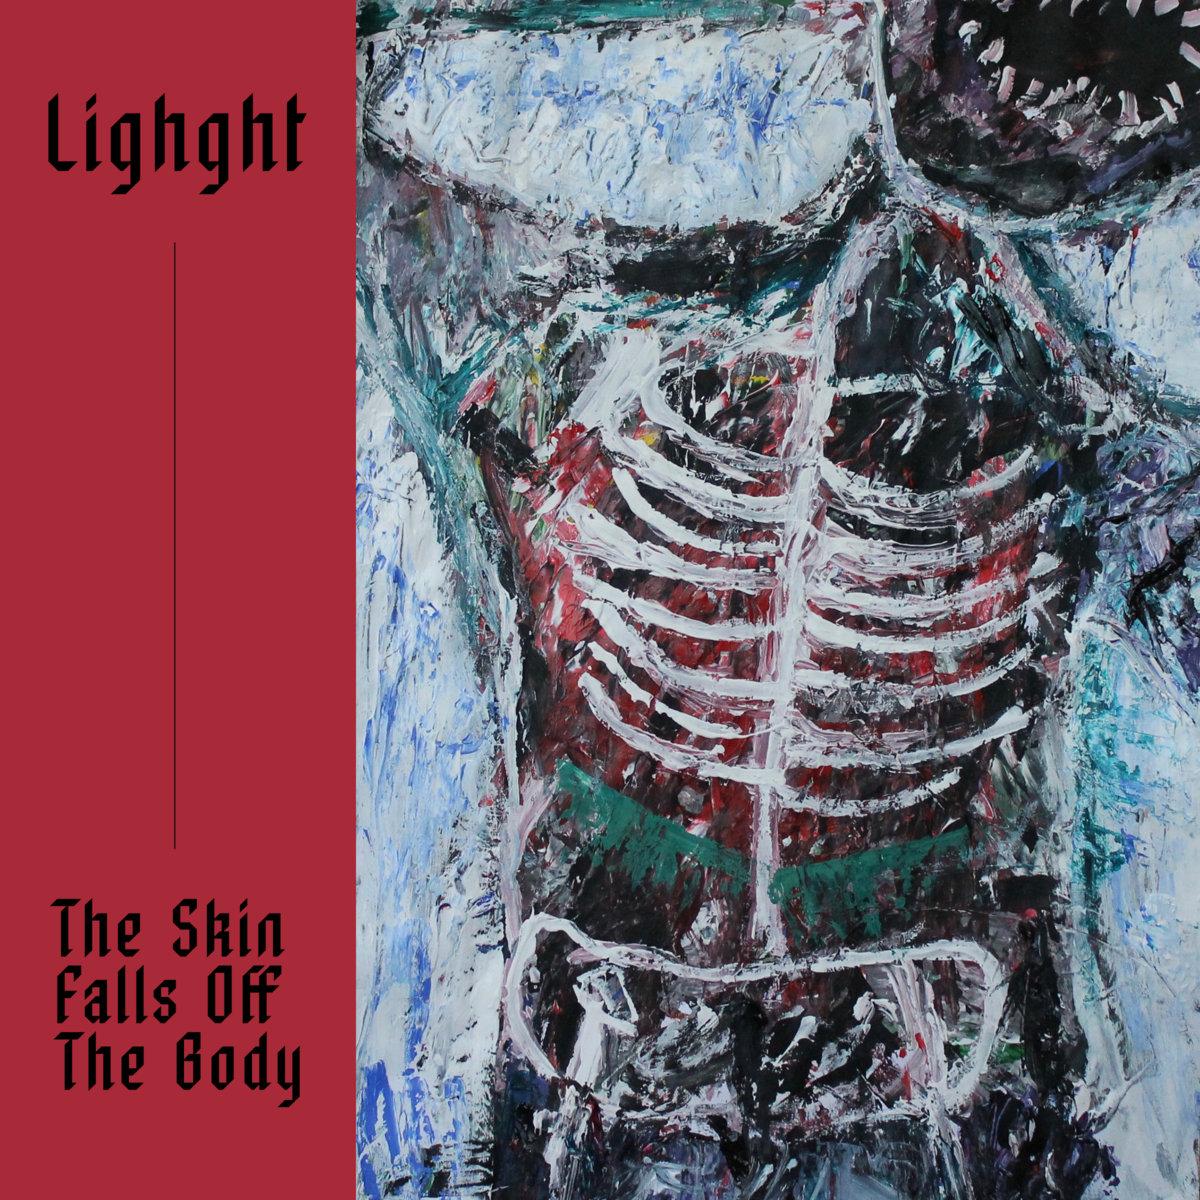 Lighght - The Skin Falls Off The Body - Dream Catalogue, Jan. 2019